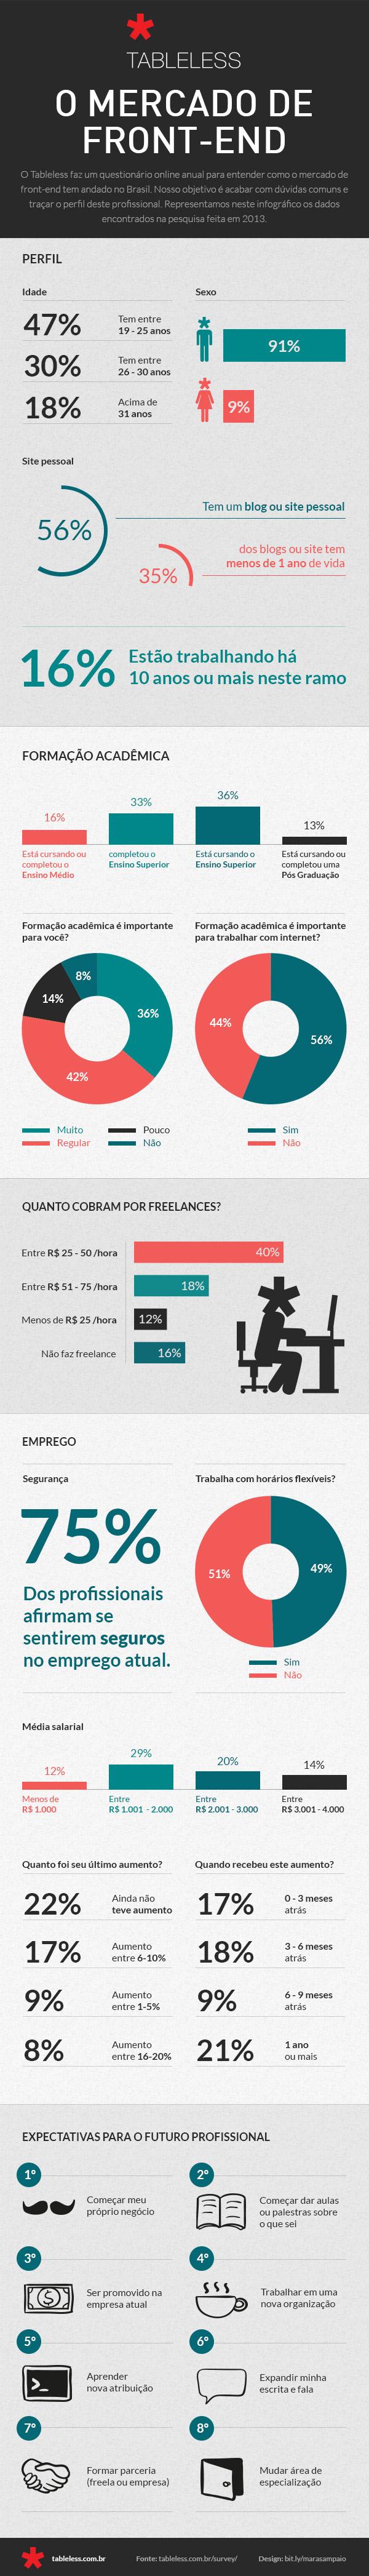 infografico_tableless-2013